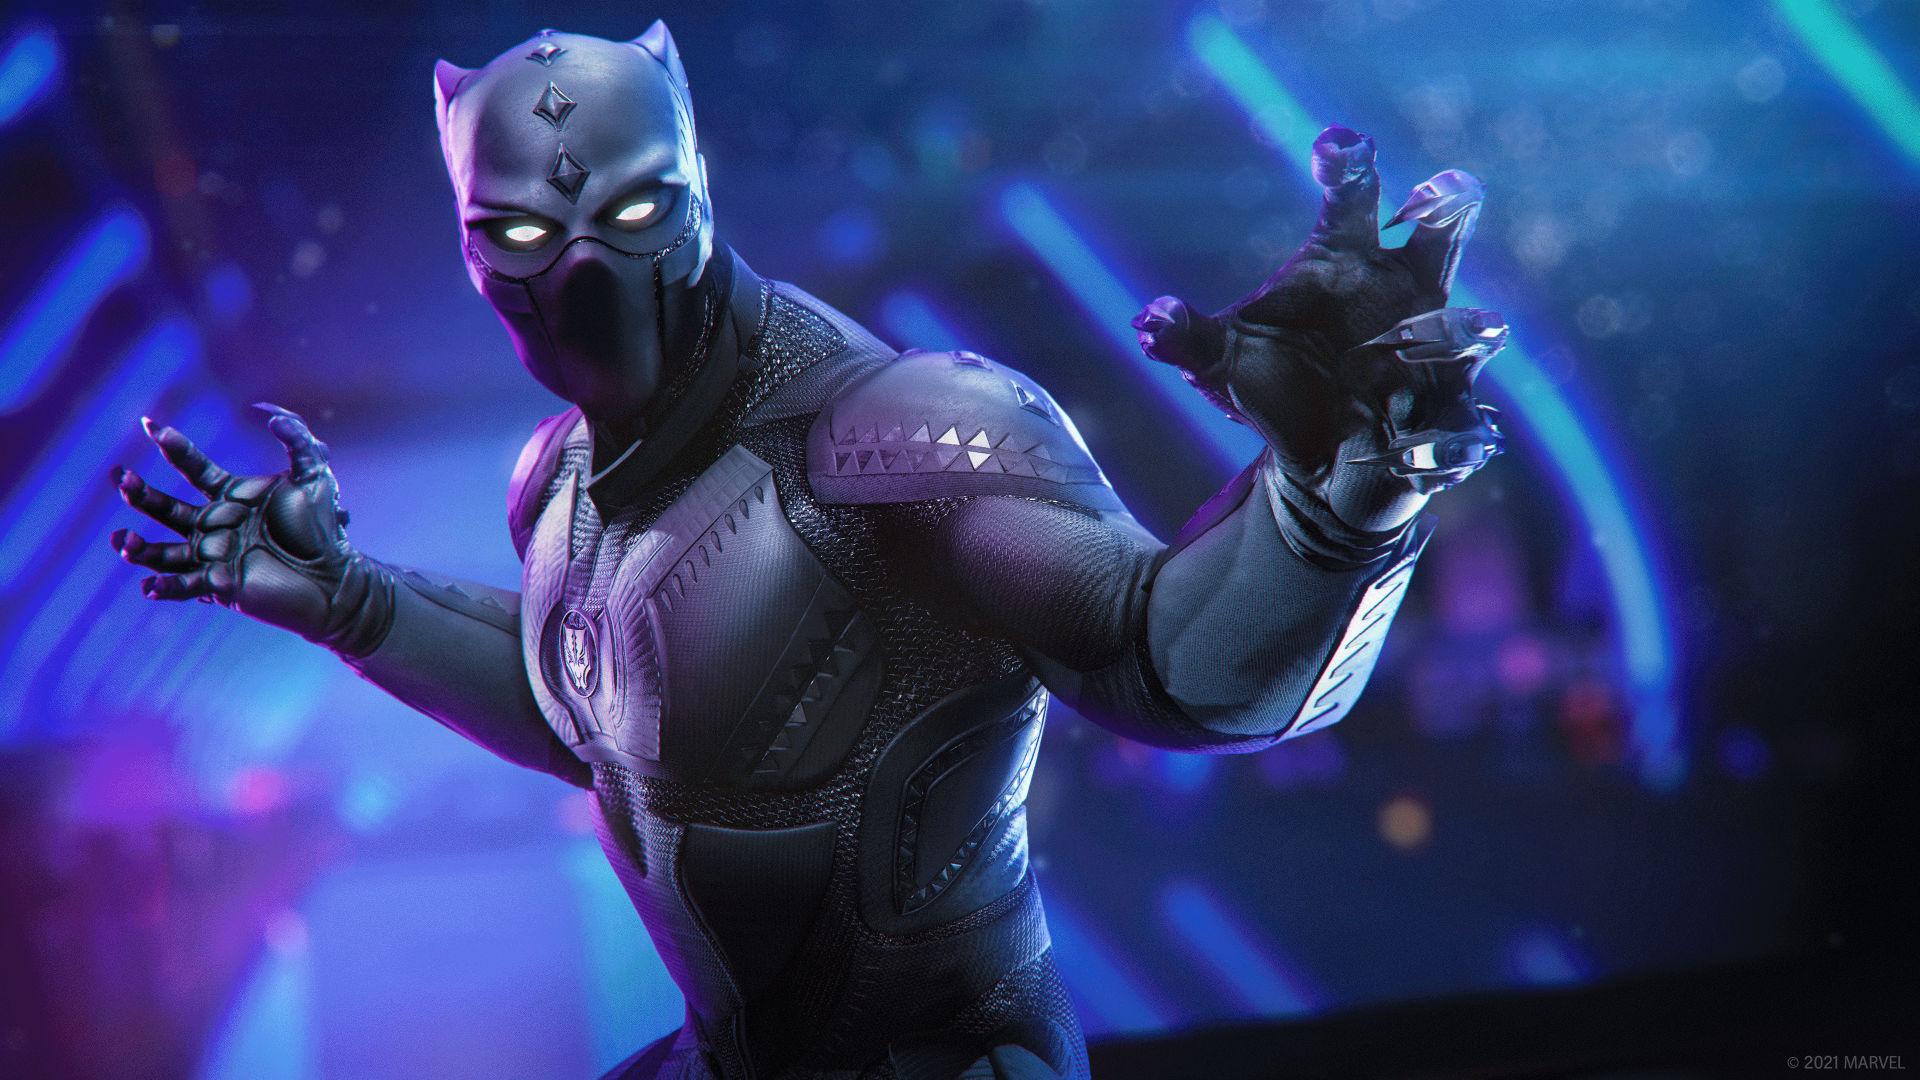 Marvels Avengers Black Panther Flexing